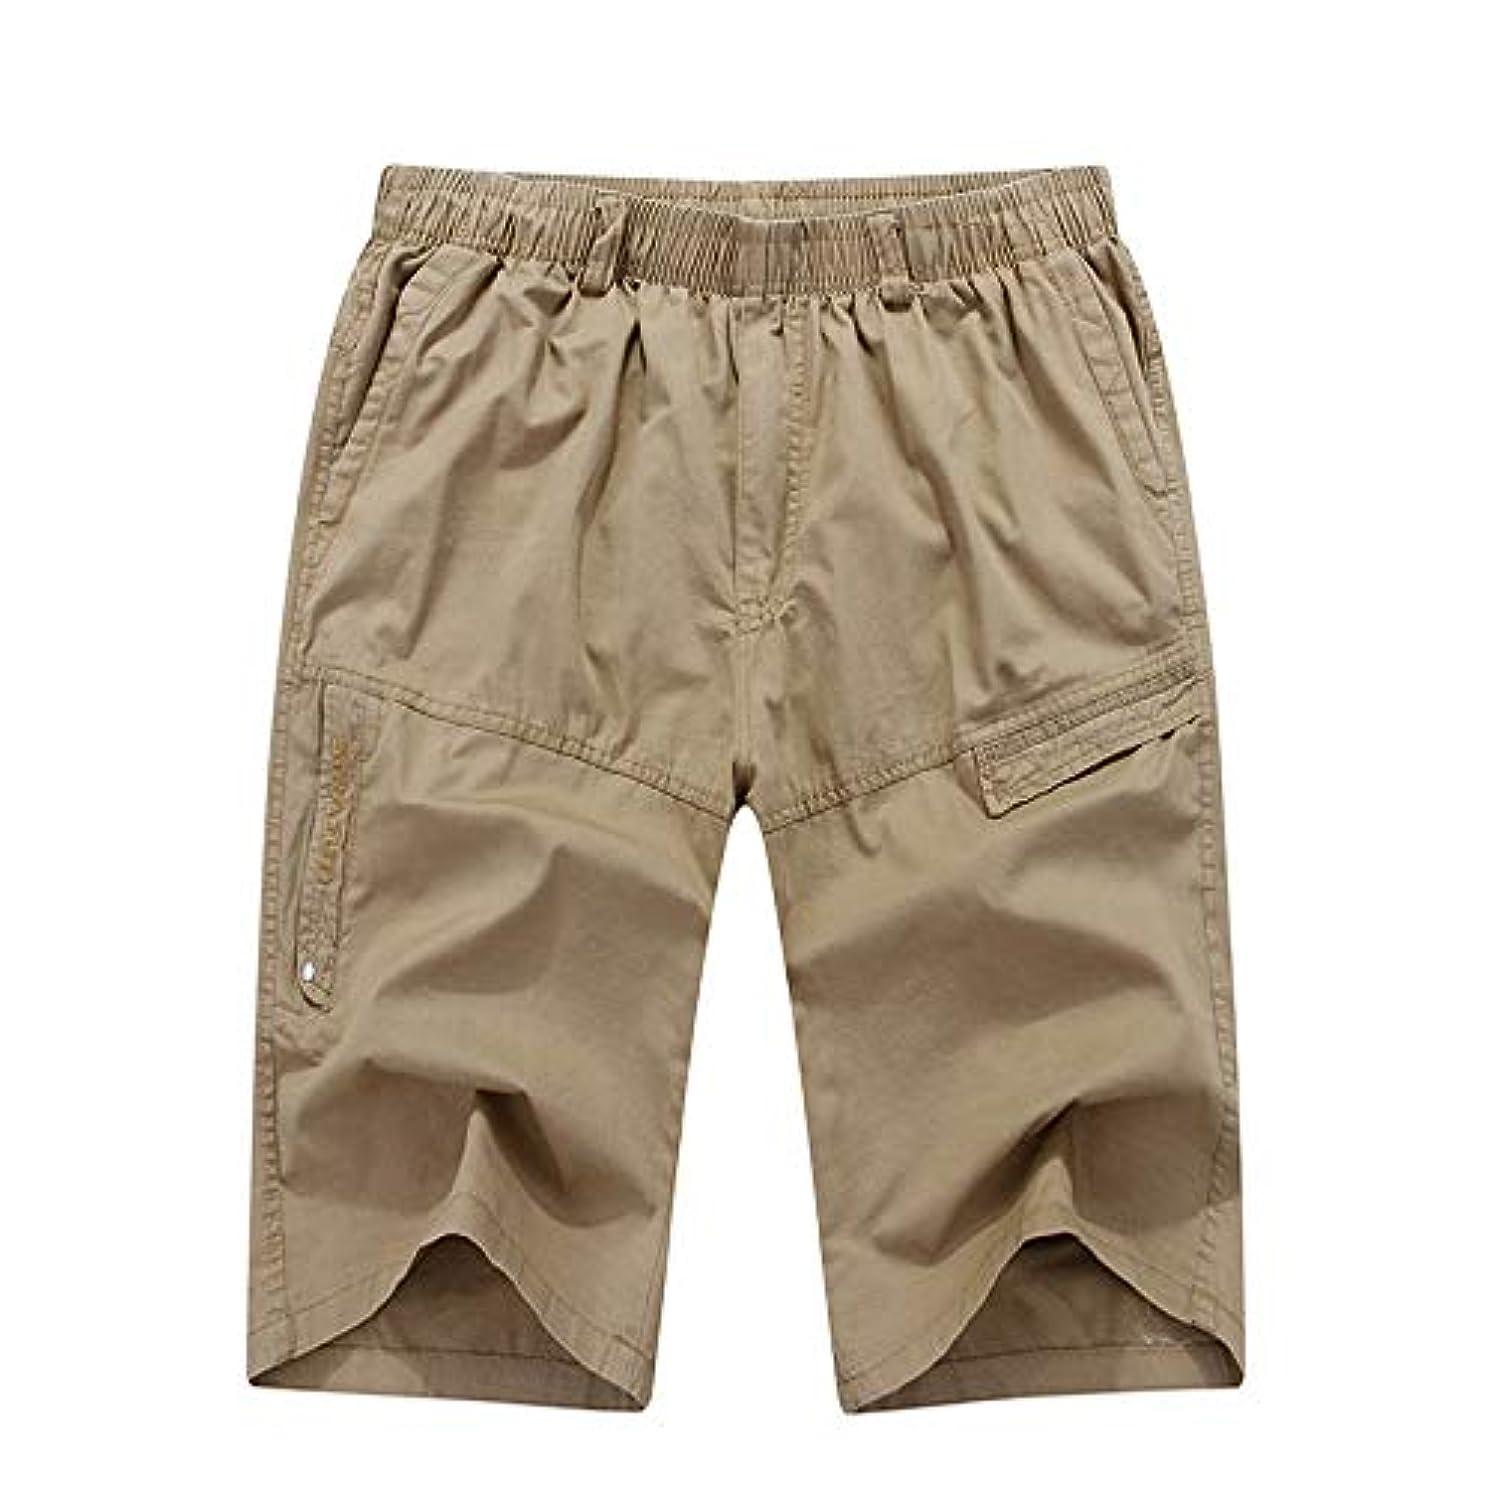 Mens Shorts Casual Shorts Cargo with Pocket Men Shorts Elastic Waist Beach Pants